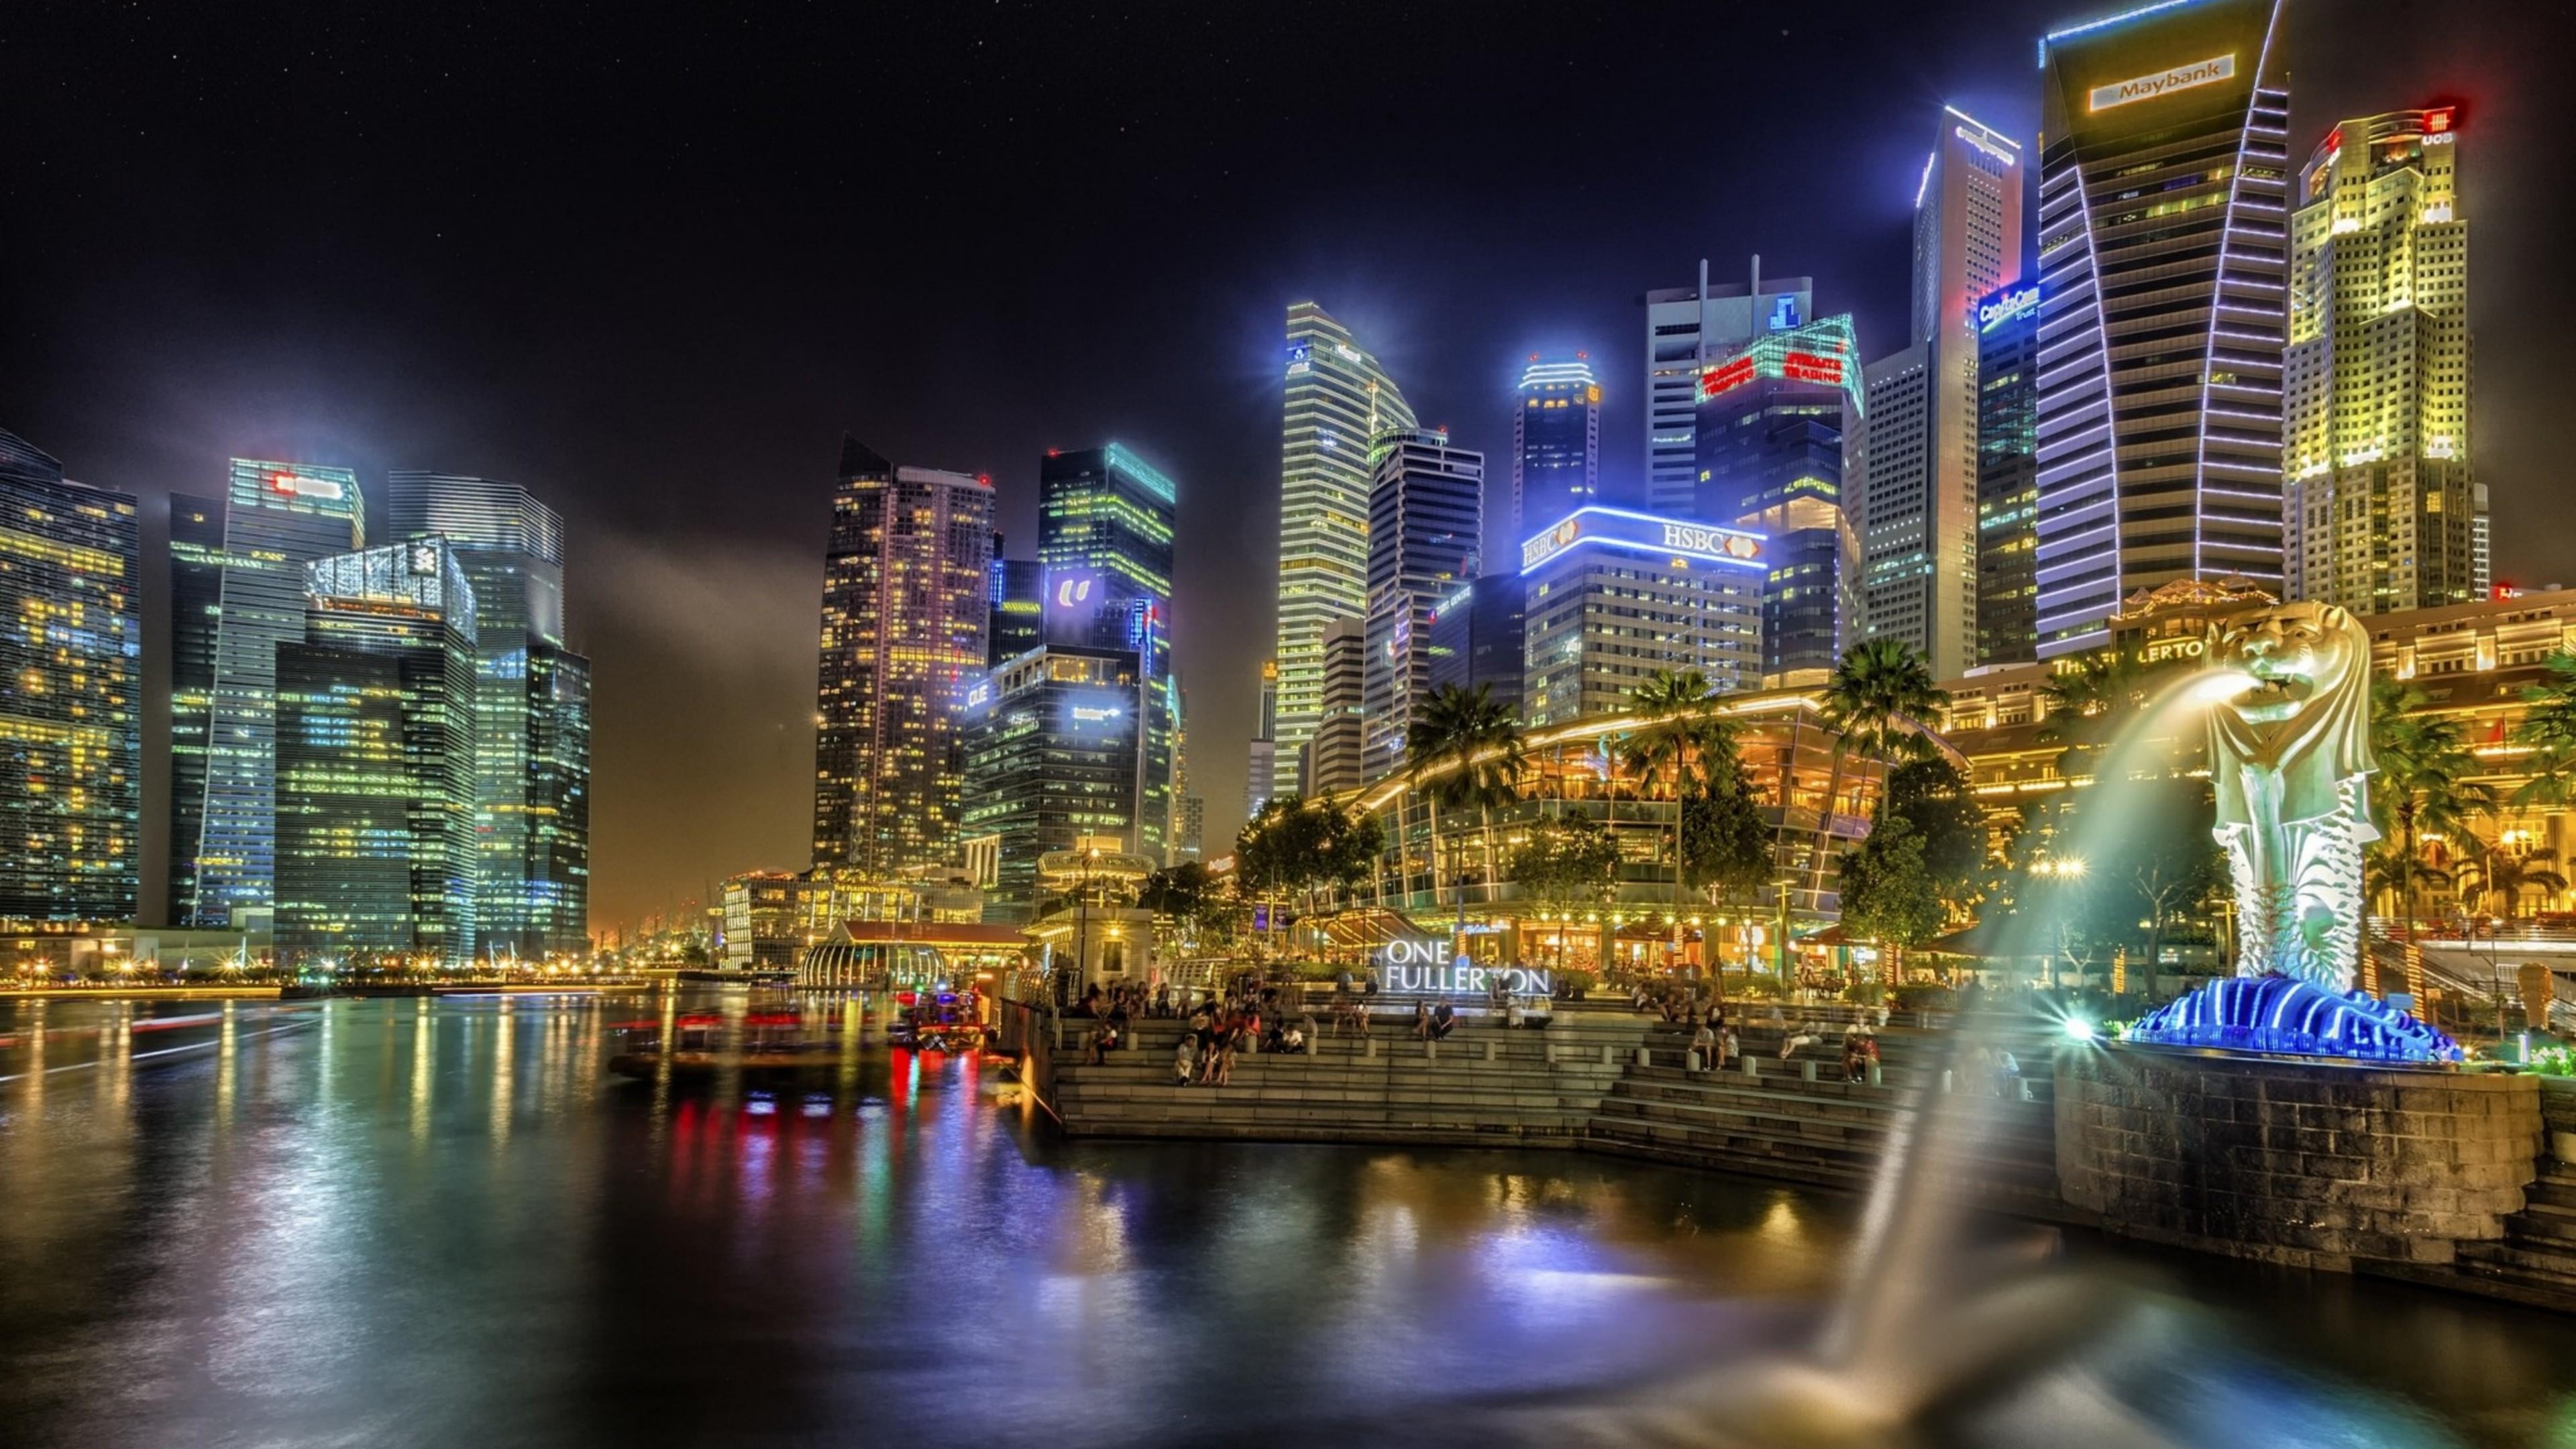 Merlion Park at night, Singapore wallpaper